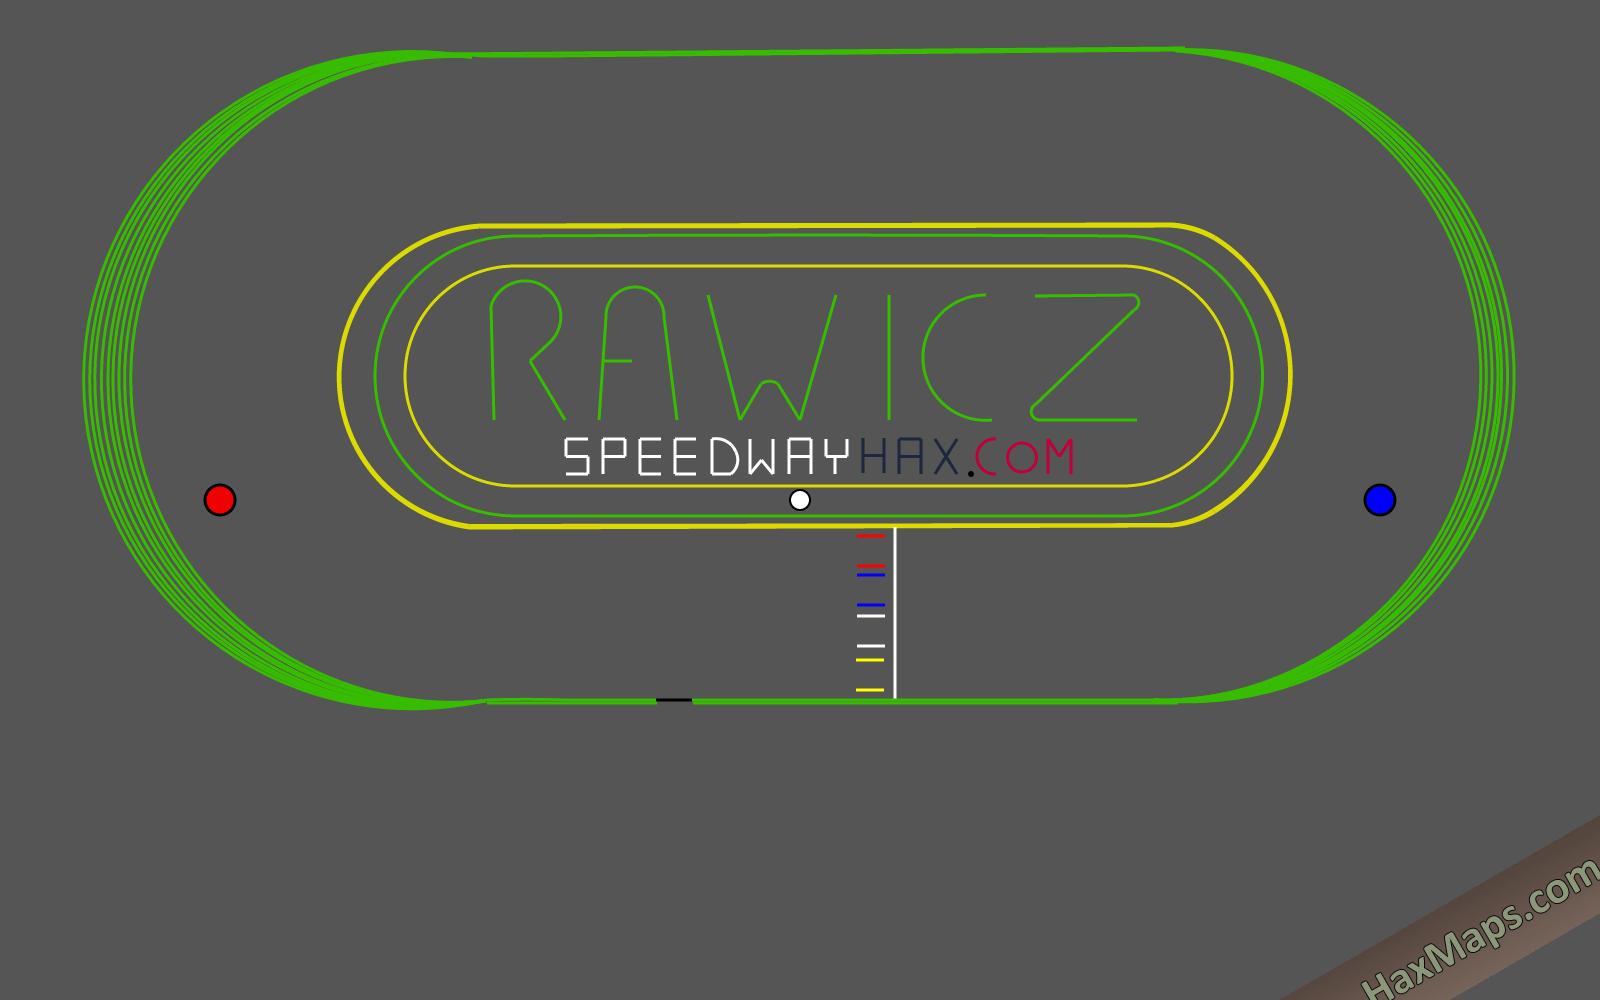 hax ball maps | Rawicz Speedway Circuit by POPkORN